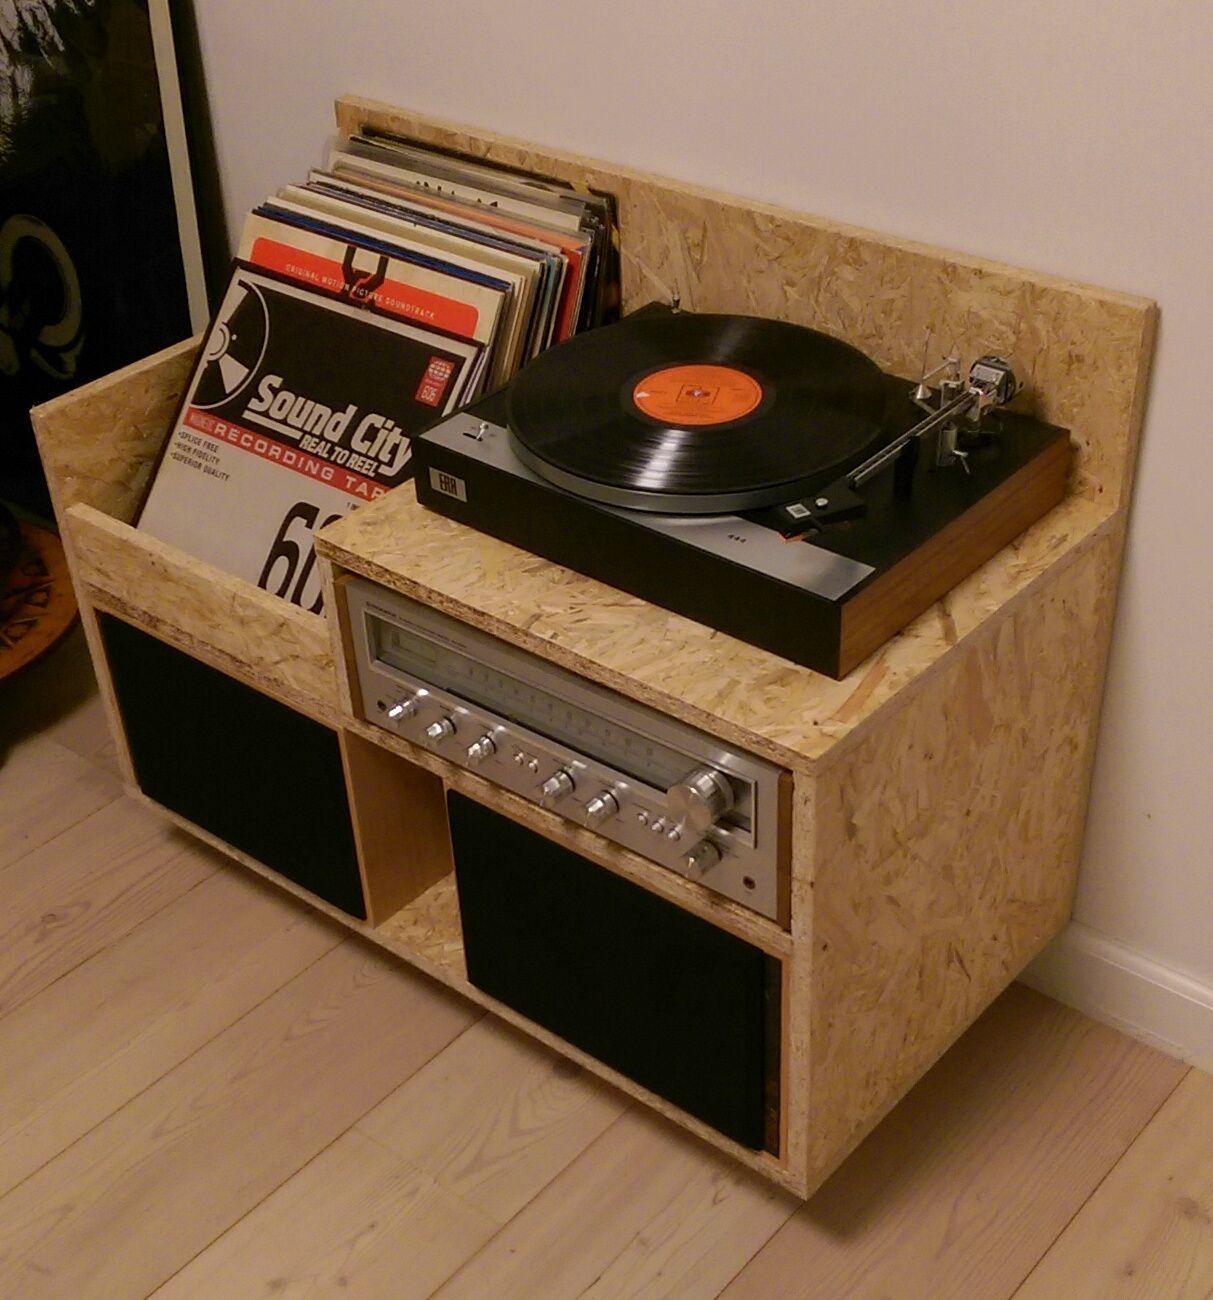 Google Image Result For Https I Pinimg Com Originals 36 D3 6c 36d36c0a26fe64ef340a7c332b68f73b Jpg In 2020 Vinyl Record Furniture Vinyl Storage Record Player Storage